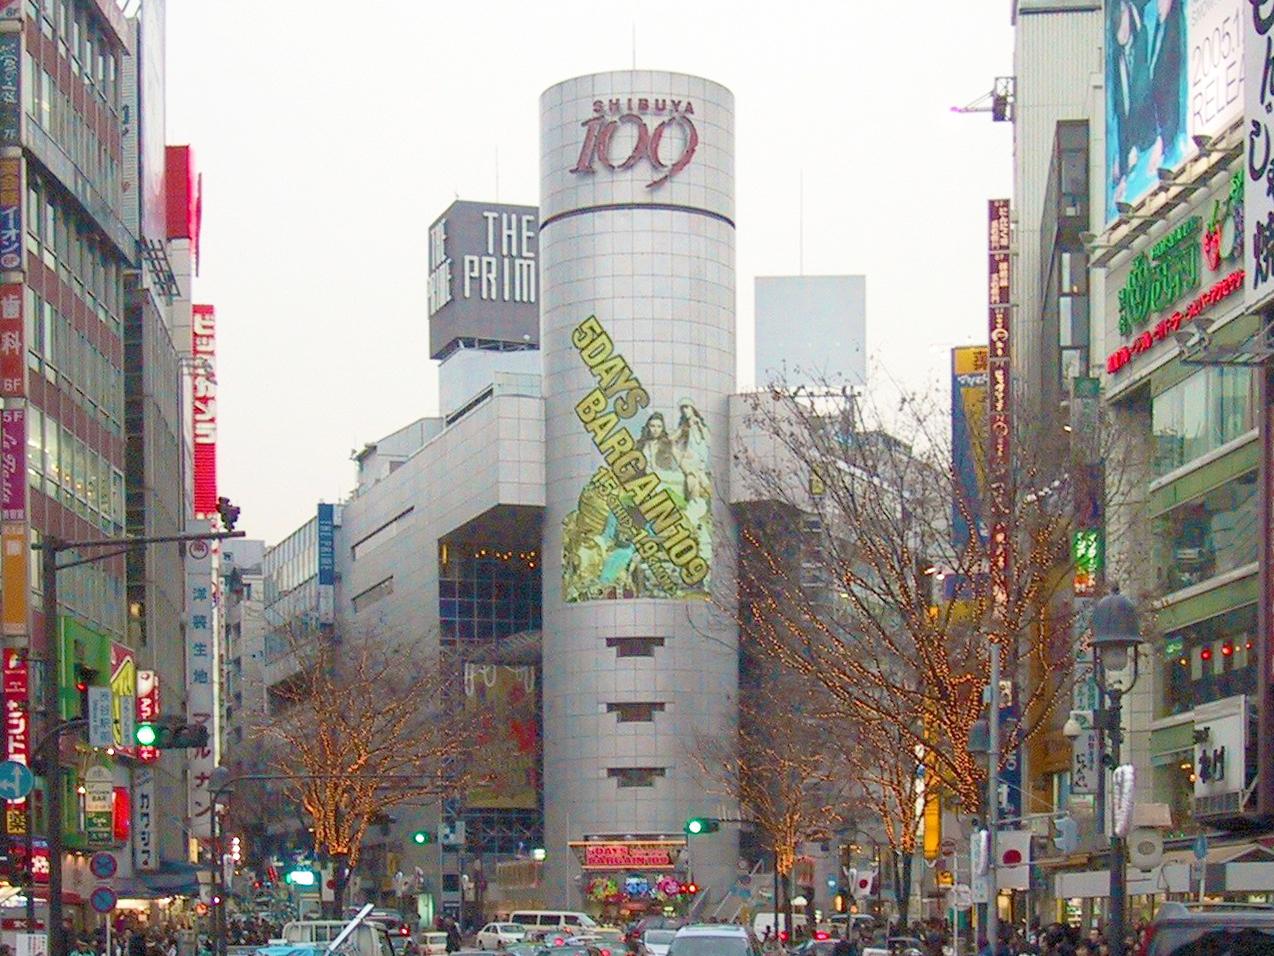 [Attēls: Shibuya_109_Building_Tokyo_January_2006.jpg]